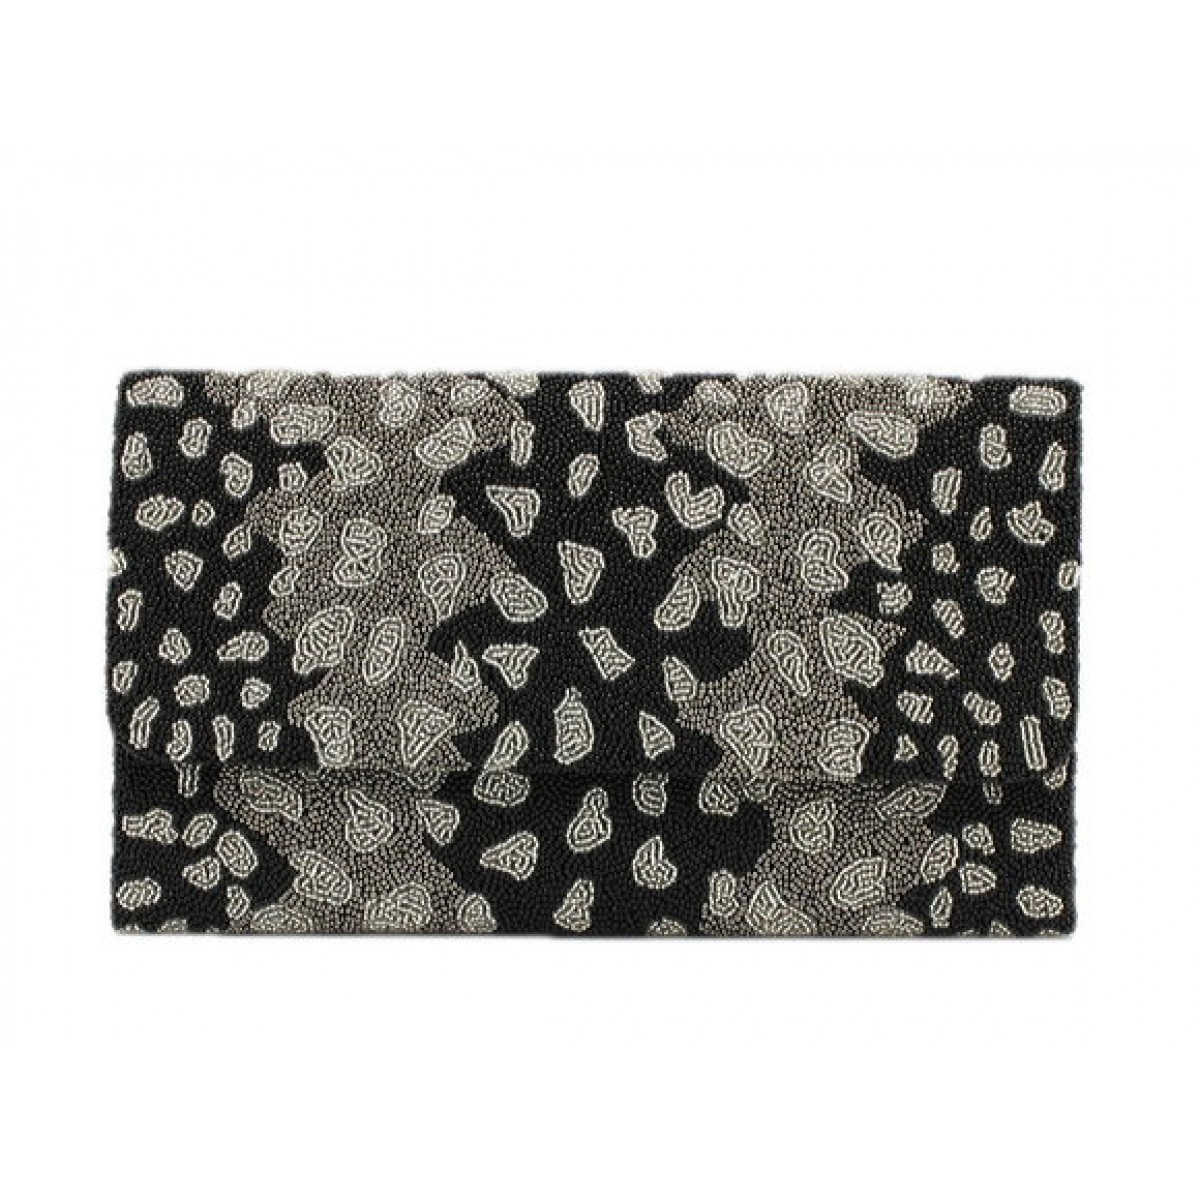 Oversize Beaded Clutch Cheetah Print